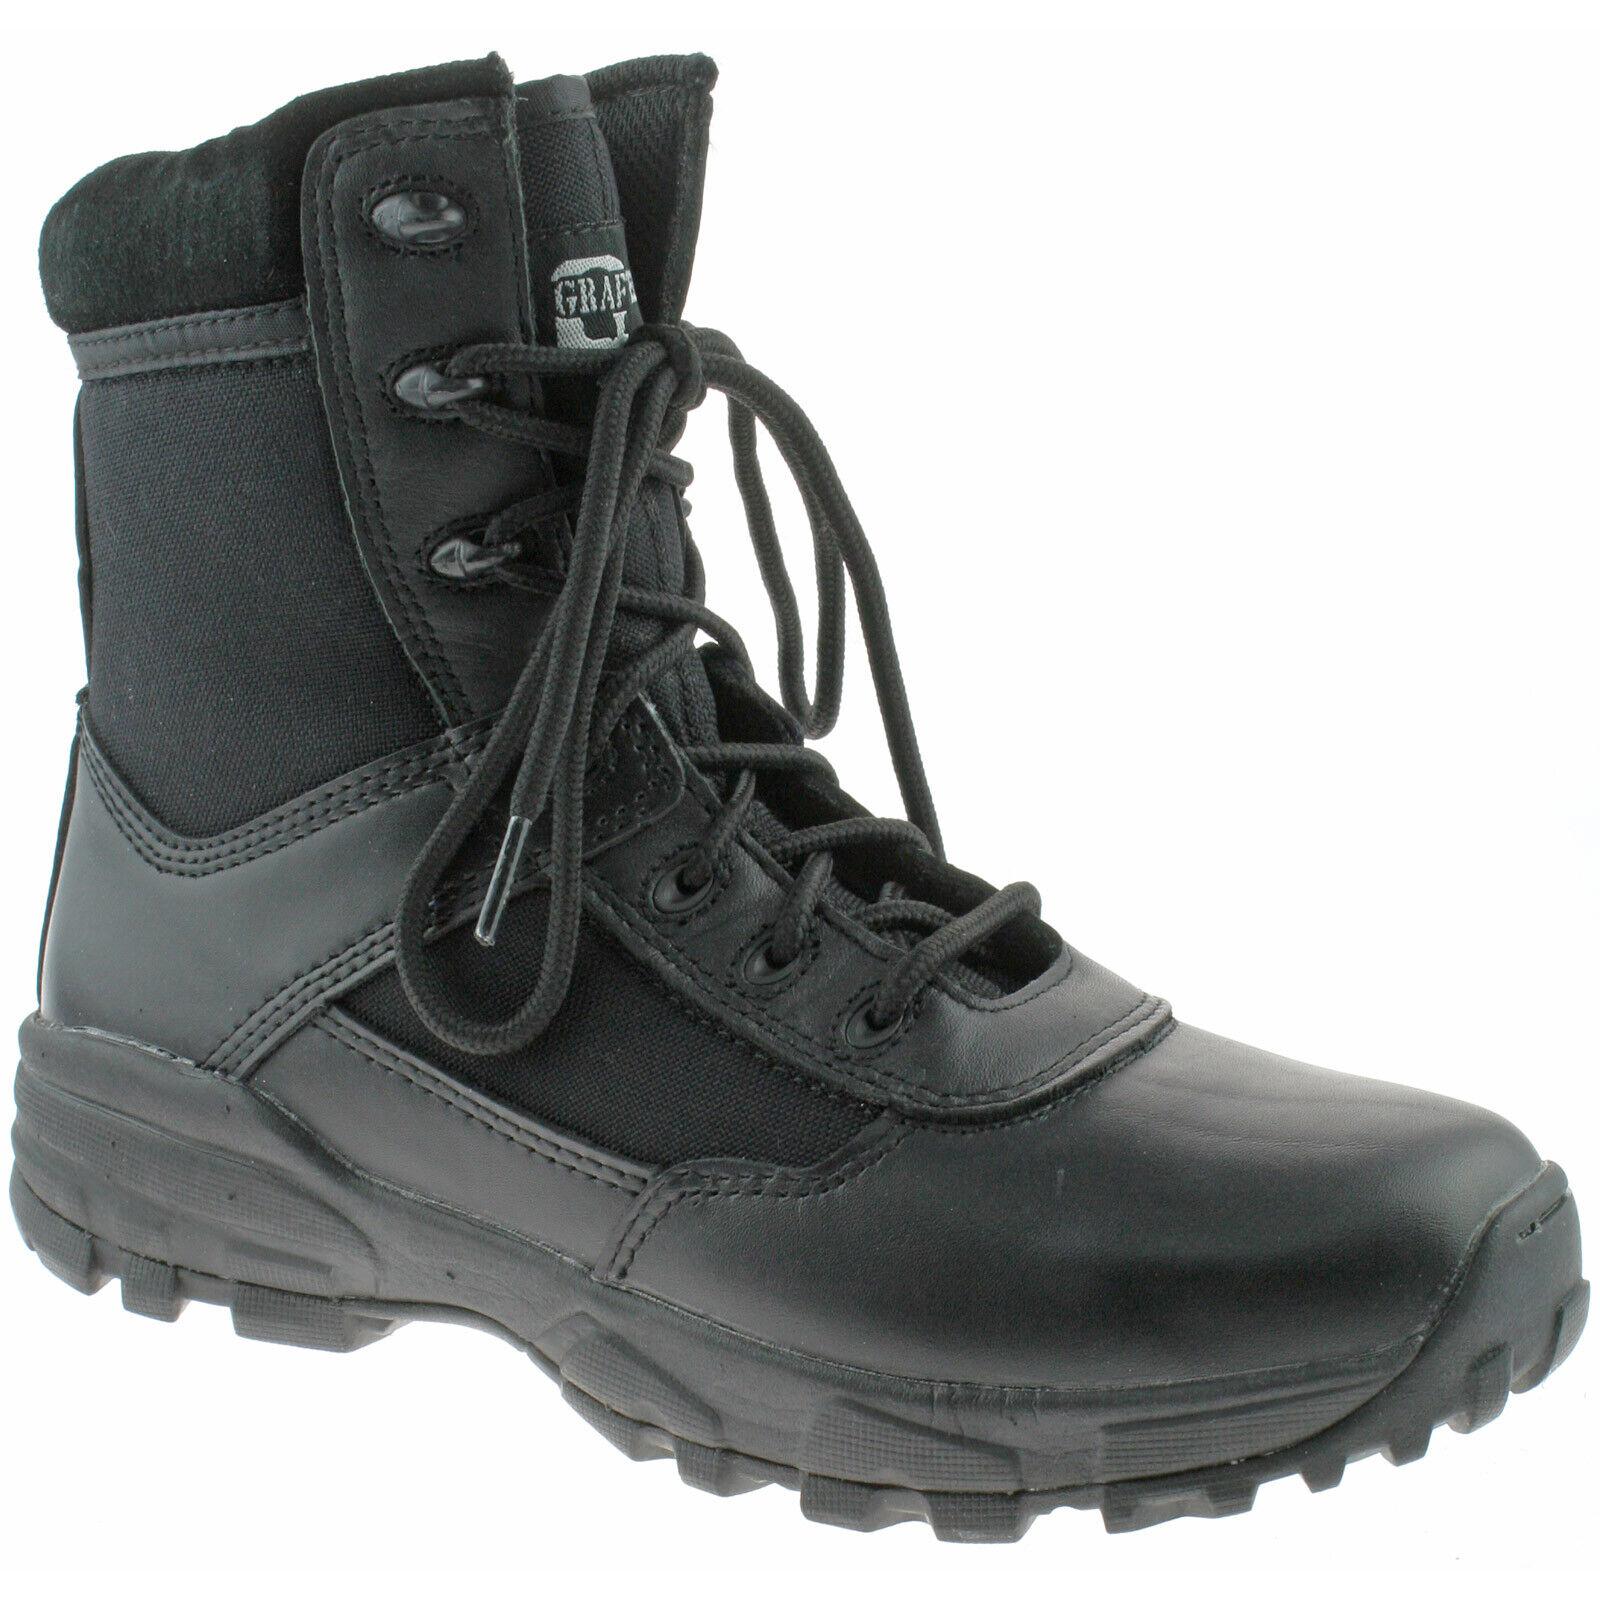 MENS GRAFTERS COMBAT CADET Stiefel Größe UK 3 - 12 NON-METALLIC TACTICAL M489A KD